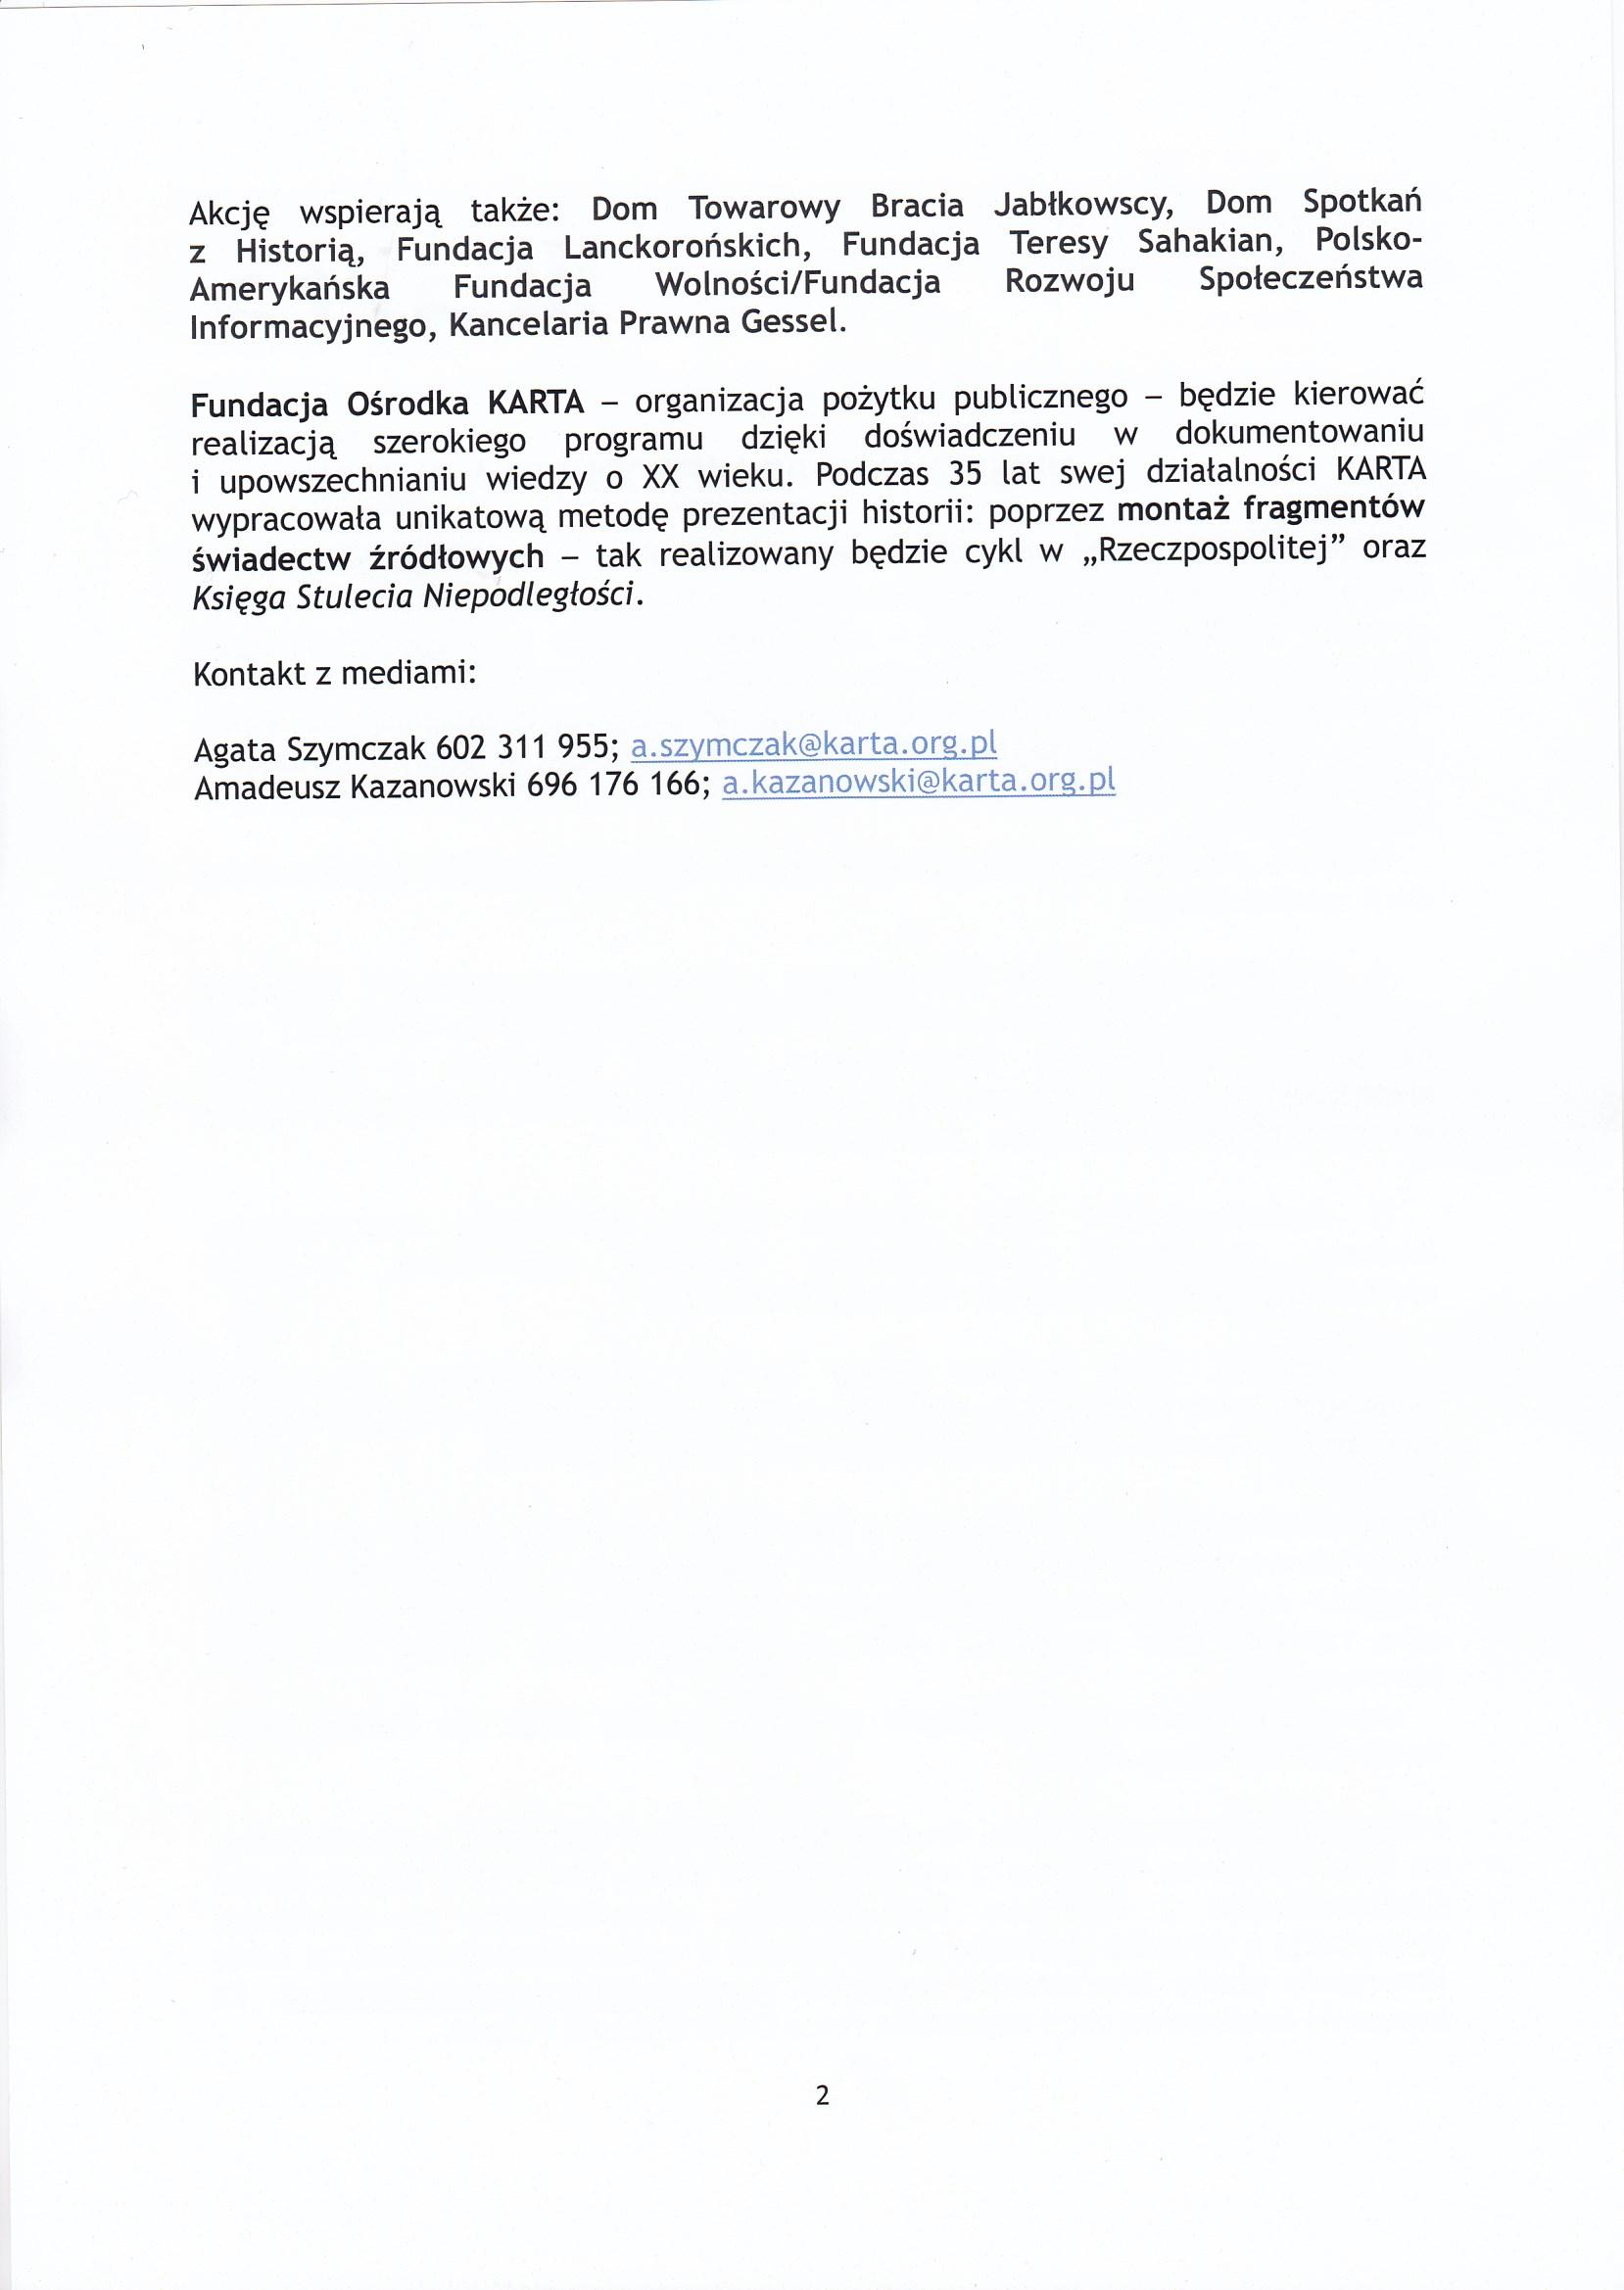 IMG_20180103_0004